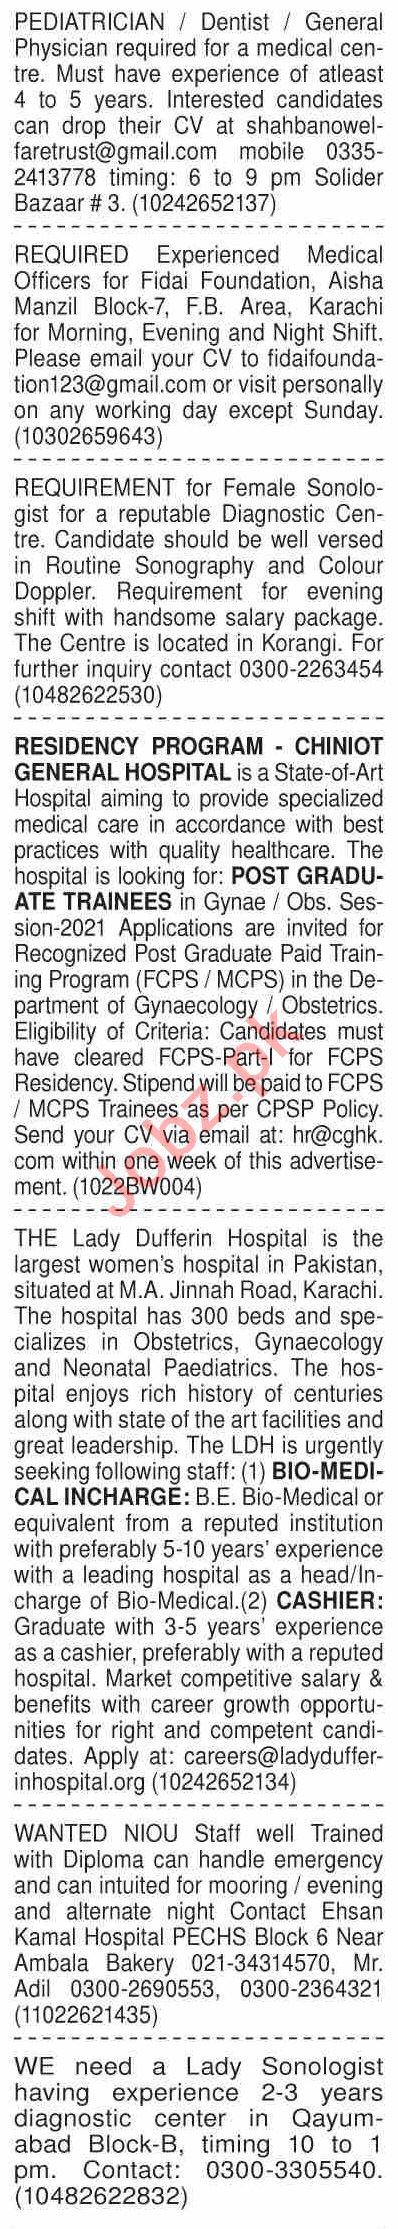 Dawn Sunday Classified Ads 6 Dec 2020 for Medical Staff